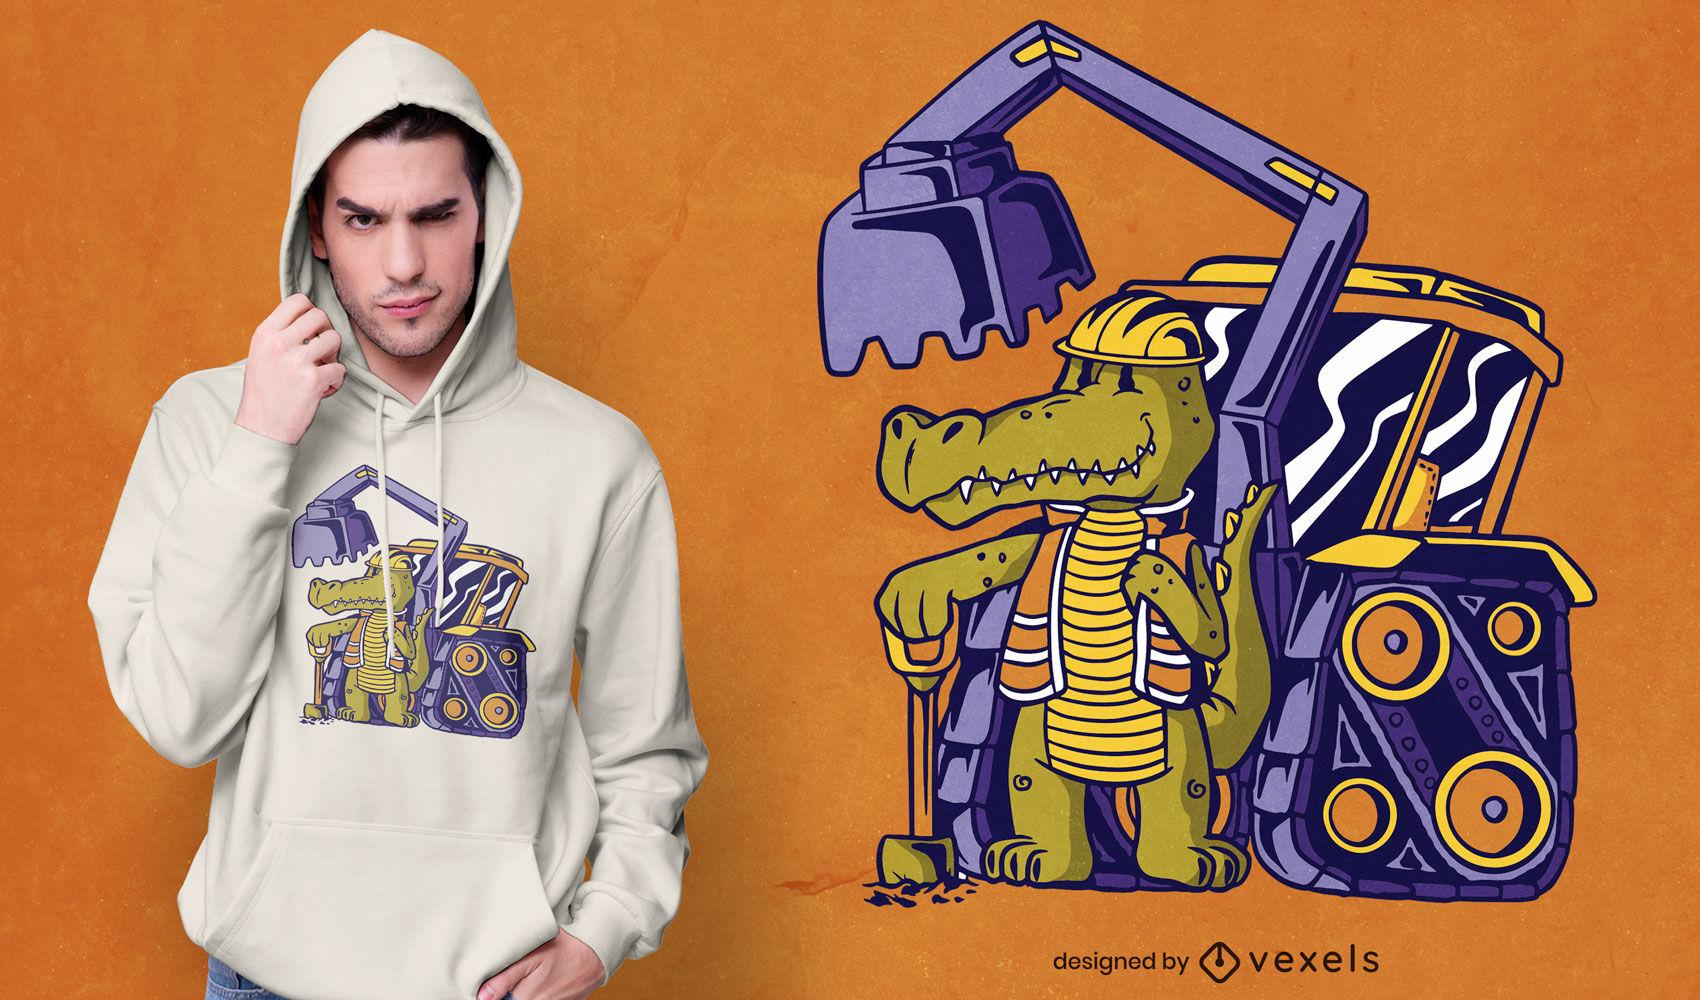 Cute crocodile worker t-shirt design